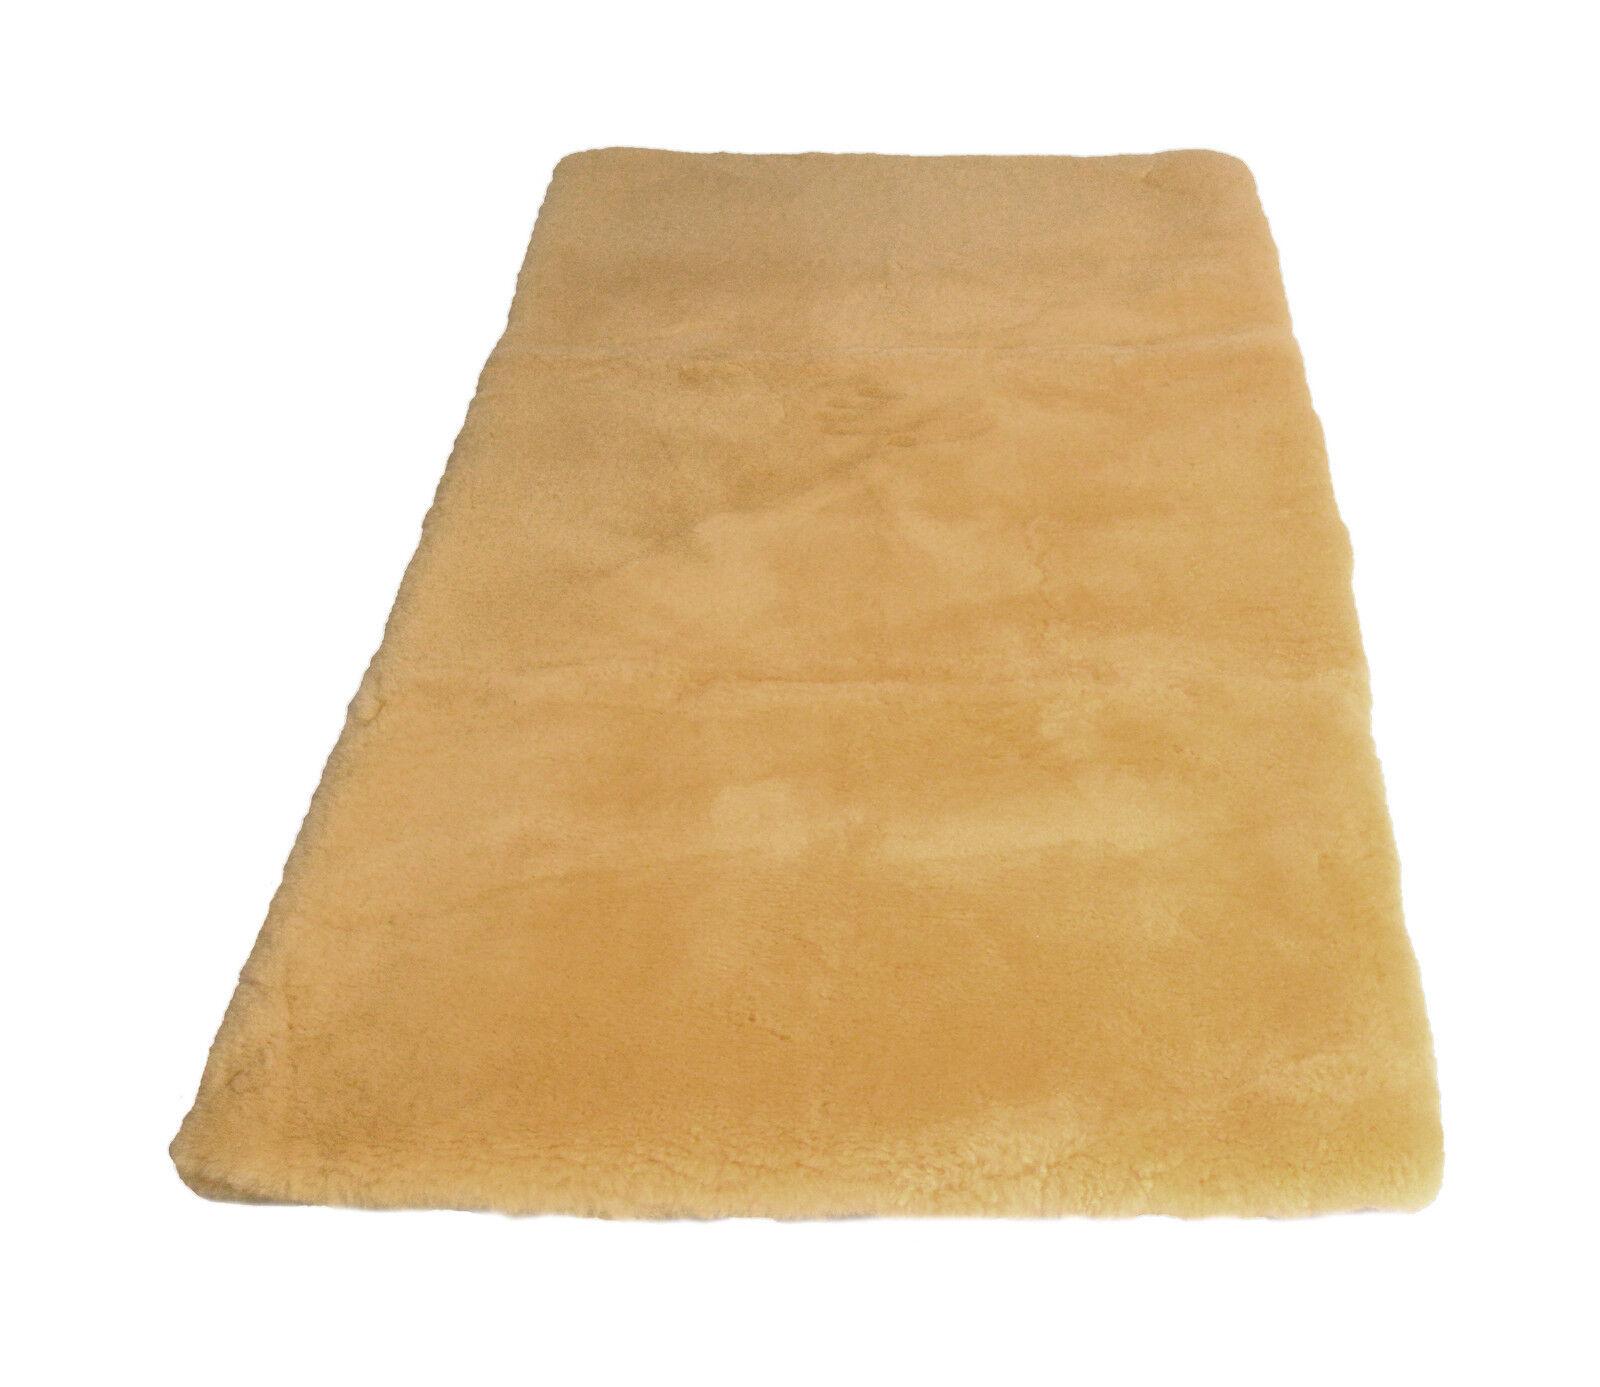 Bettfell   Bettauflage medizinisches Lammfell 160cm x 80cm + GRATIS Waschmittel